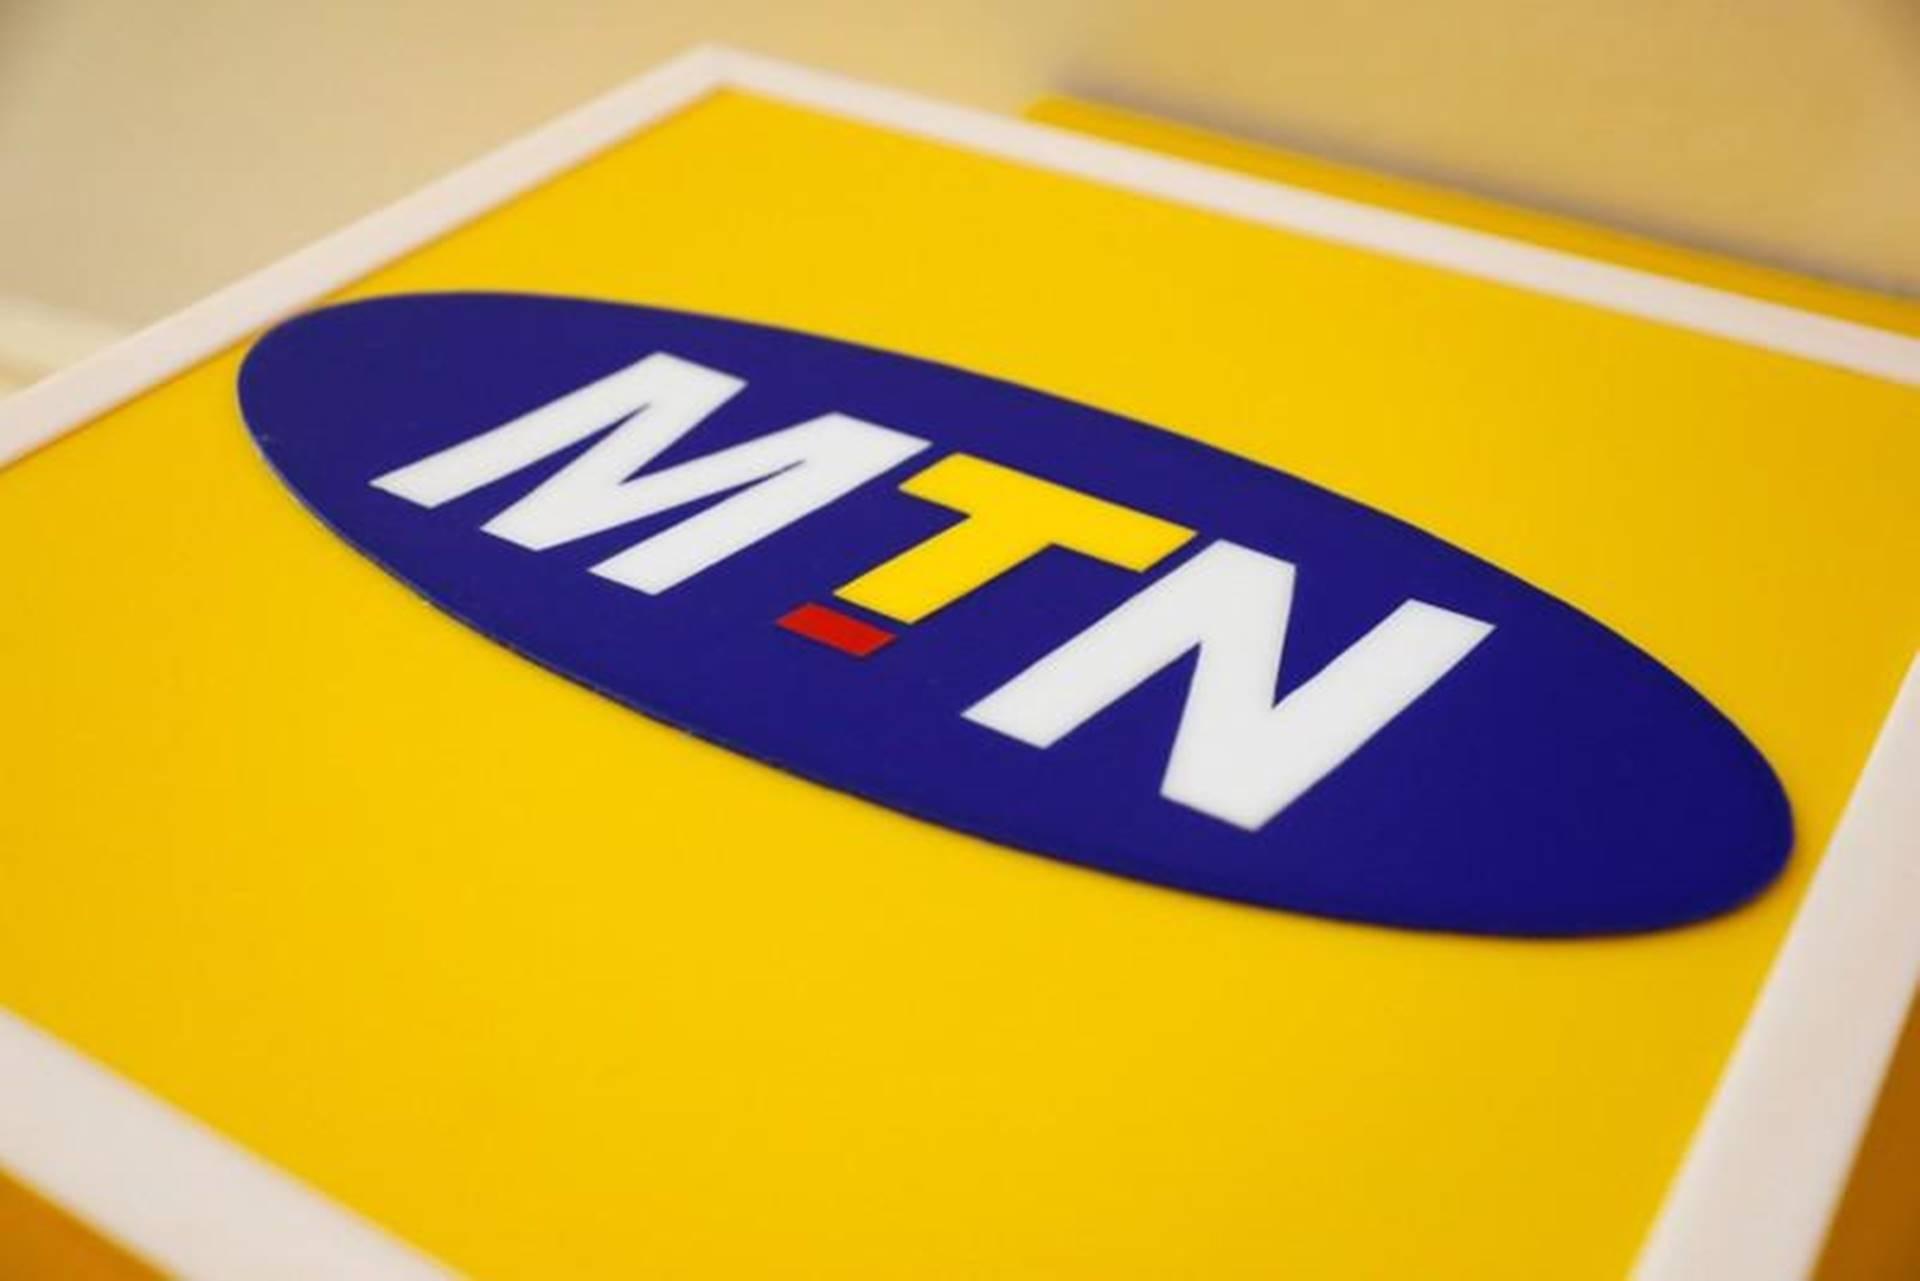 Mtn Cameroon Free Internet Bundles Tariffs Codes 2020